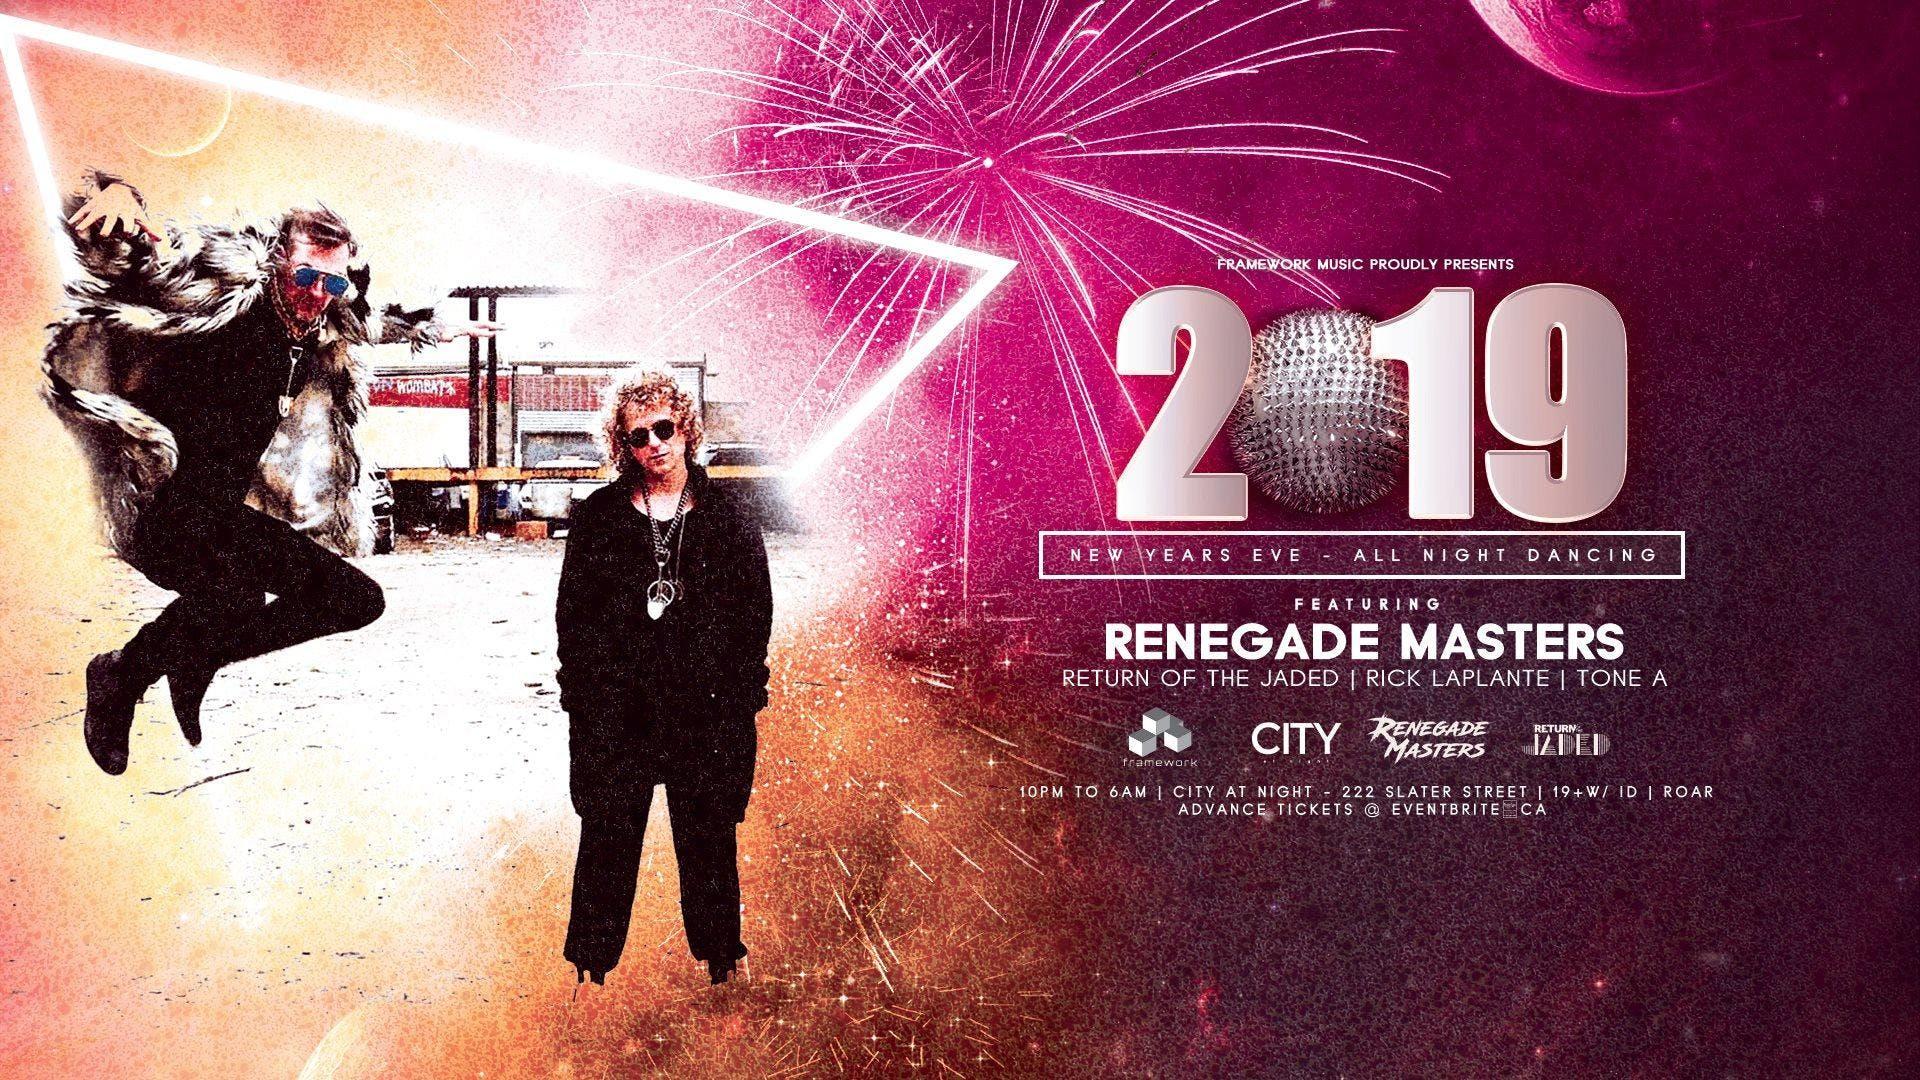 Framework Music NYE w/ Renegade Masters 10pm